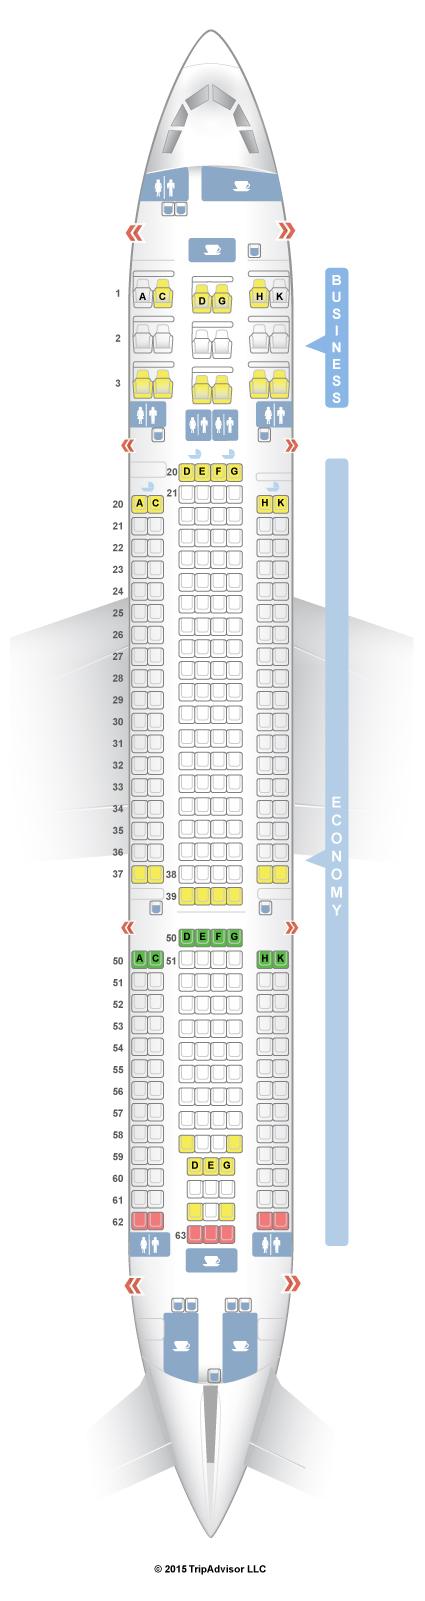 airbus a330 200 seat map Seatguru Seat Map Srilankan Airlines Seatguru airbus a330 200 seat map